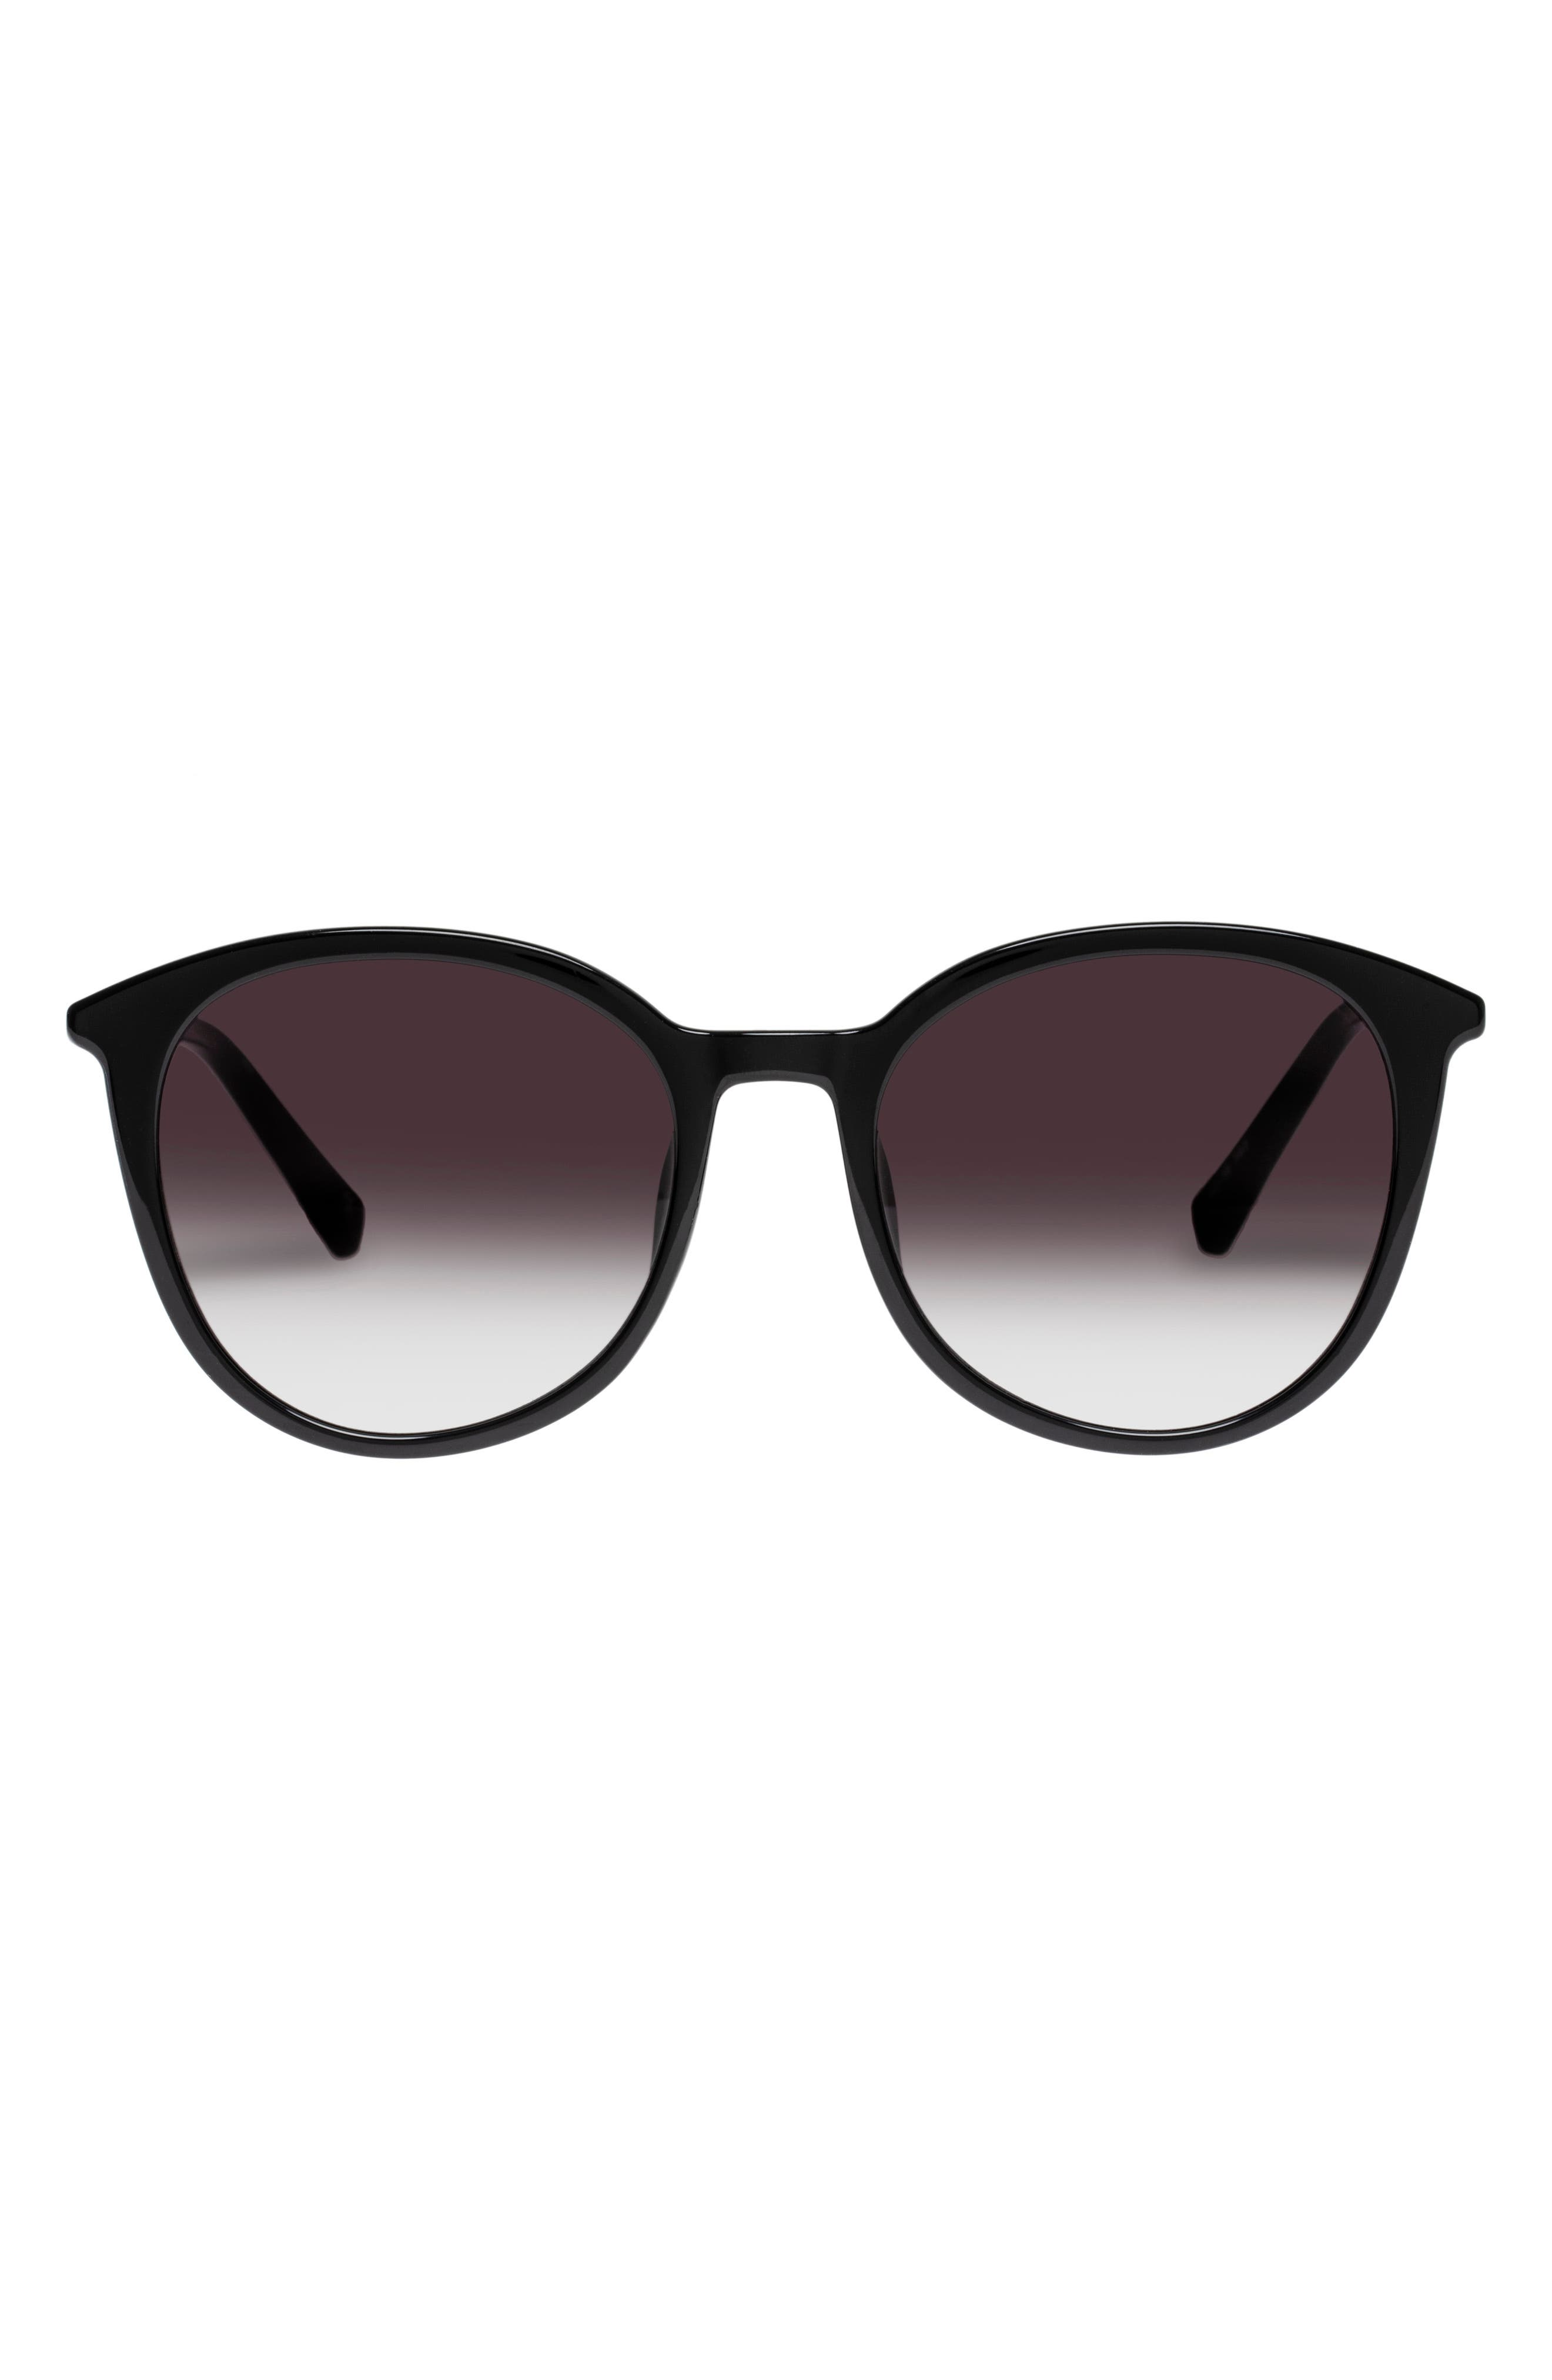 Le Danzing 52mm Gradient Round Sunglasses